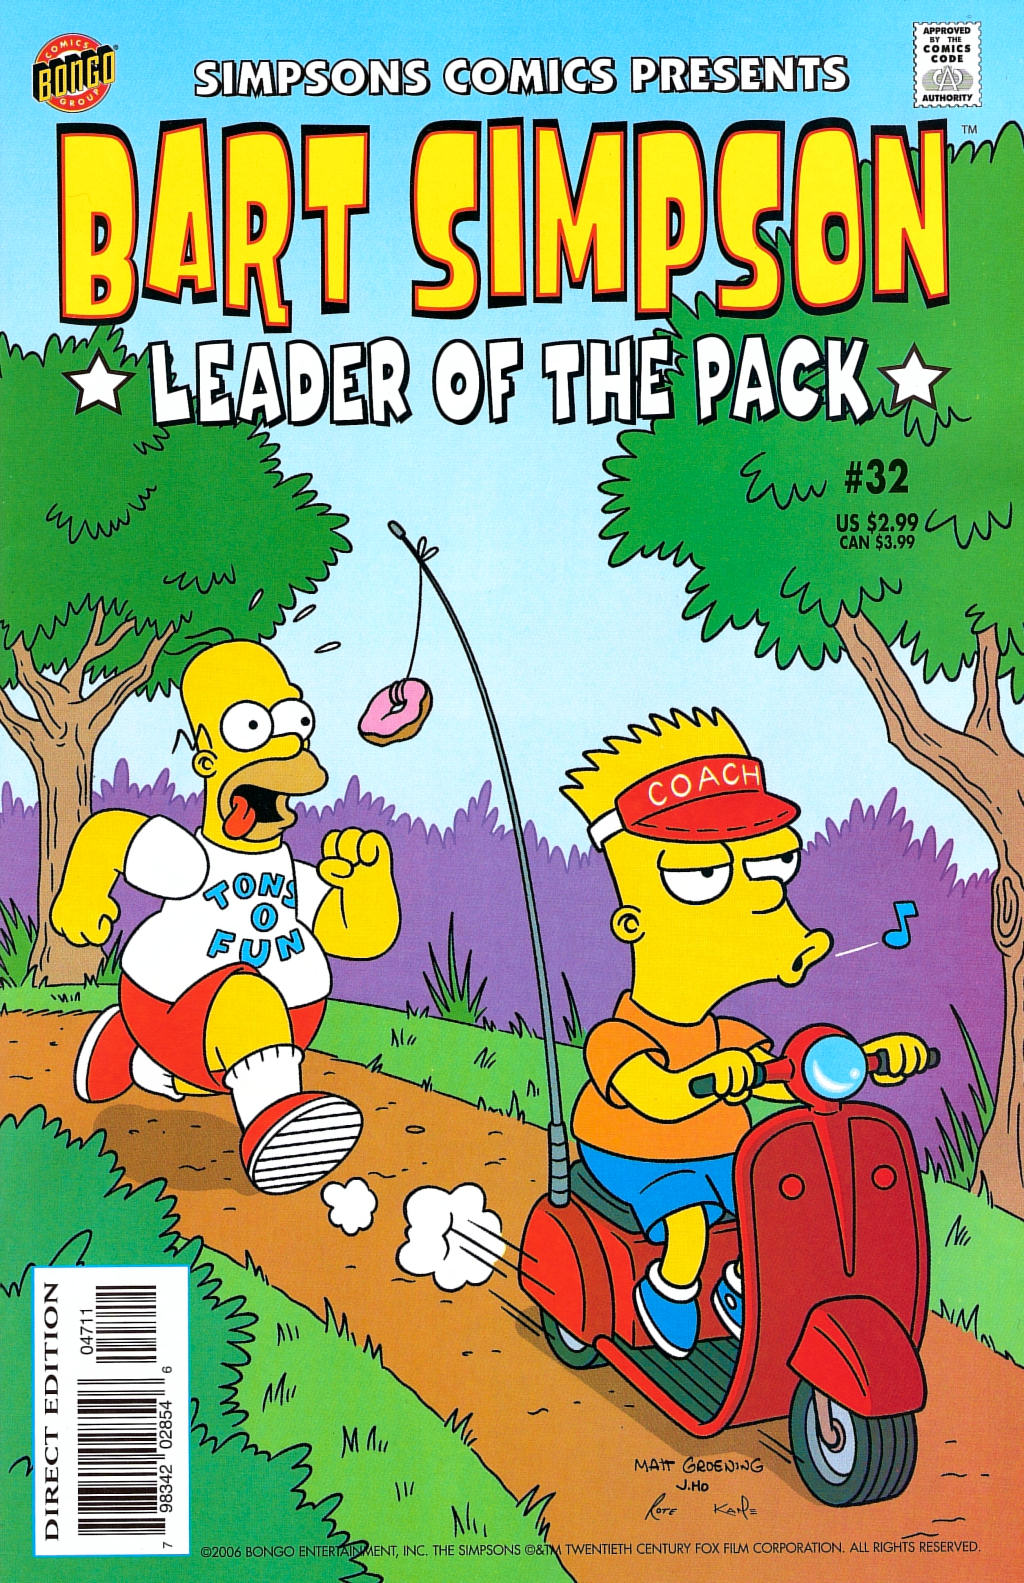 Simpsons Comics Presents Bart Simpson 32 Page 1